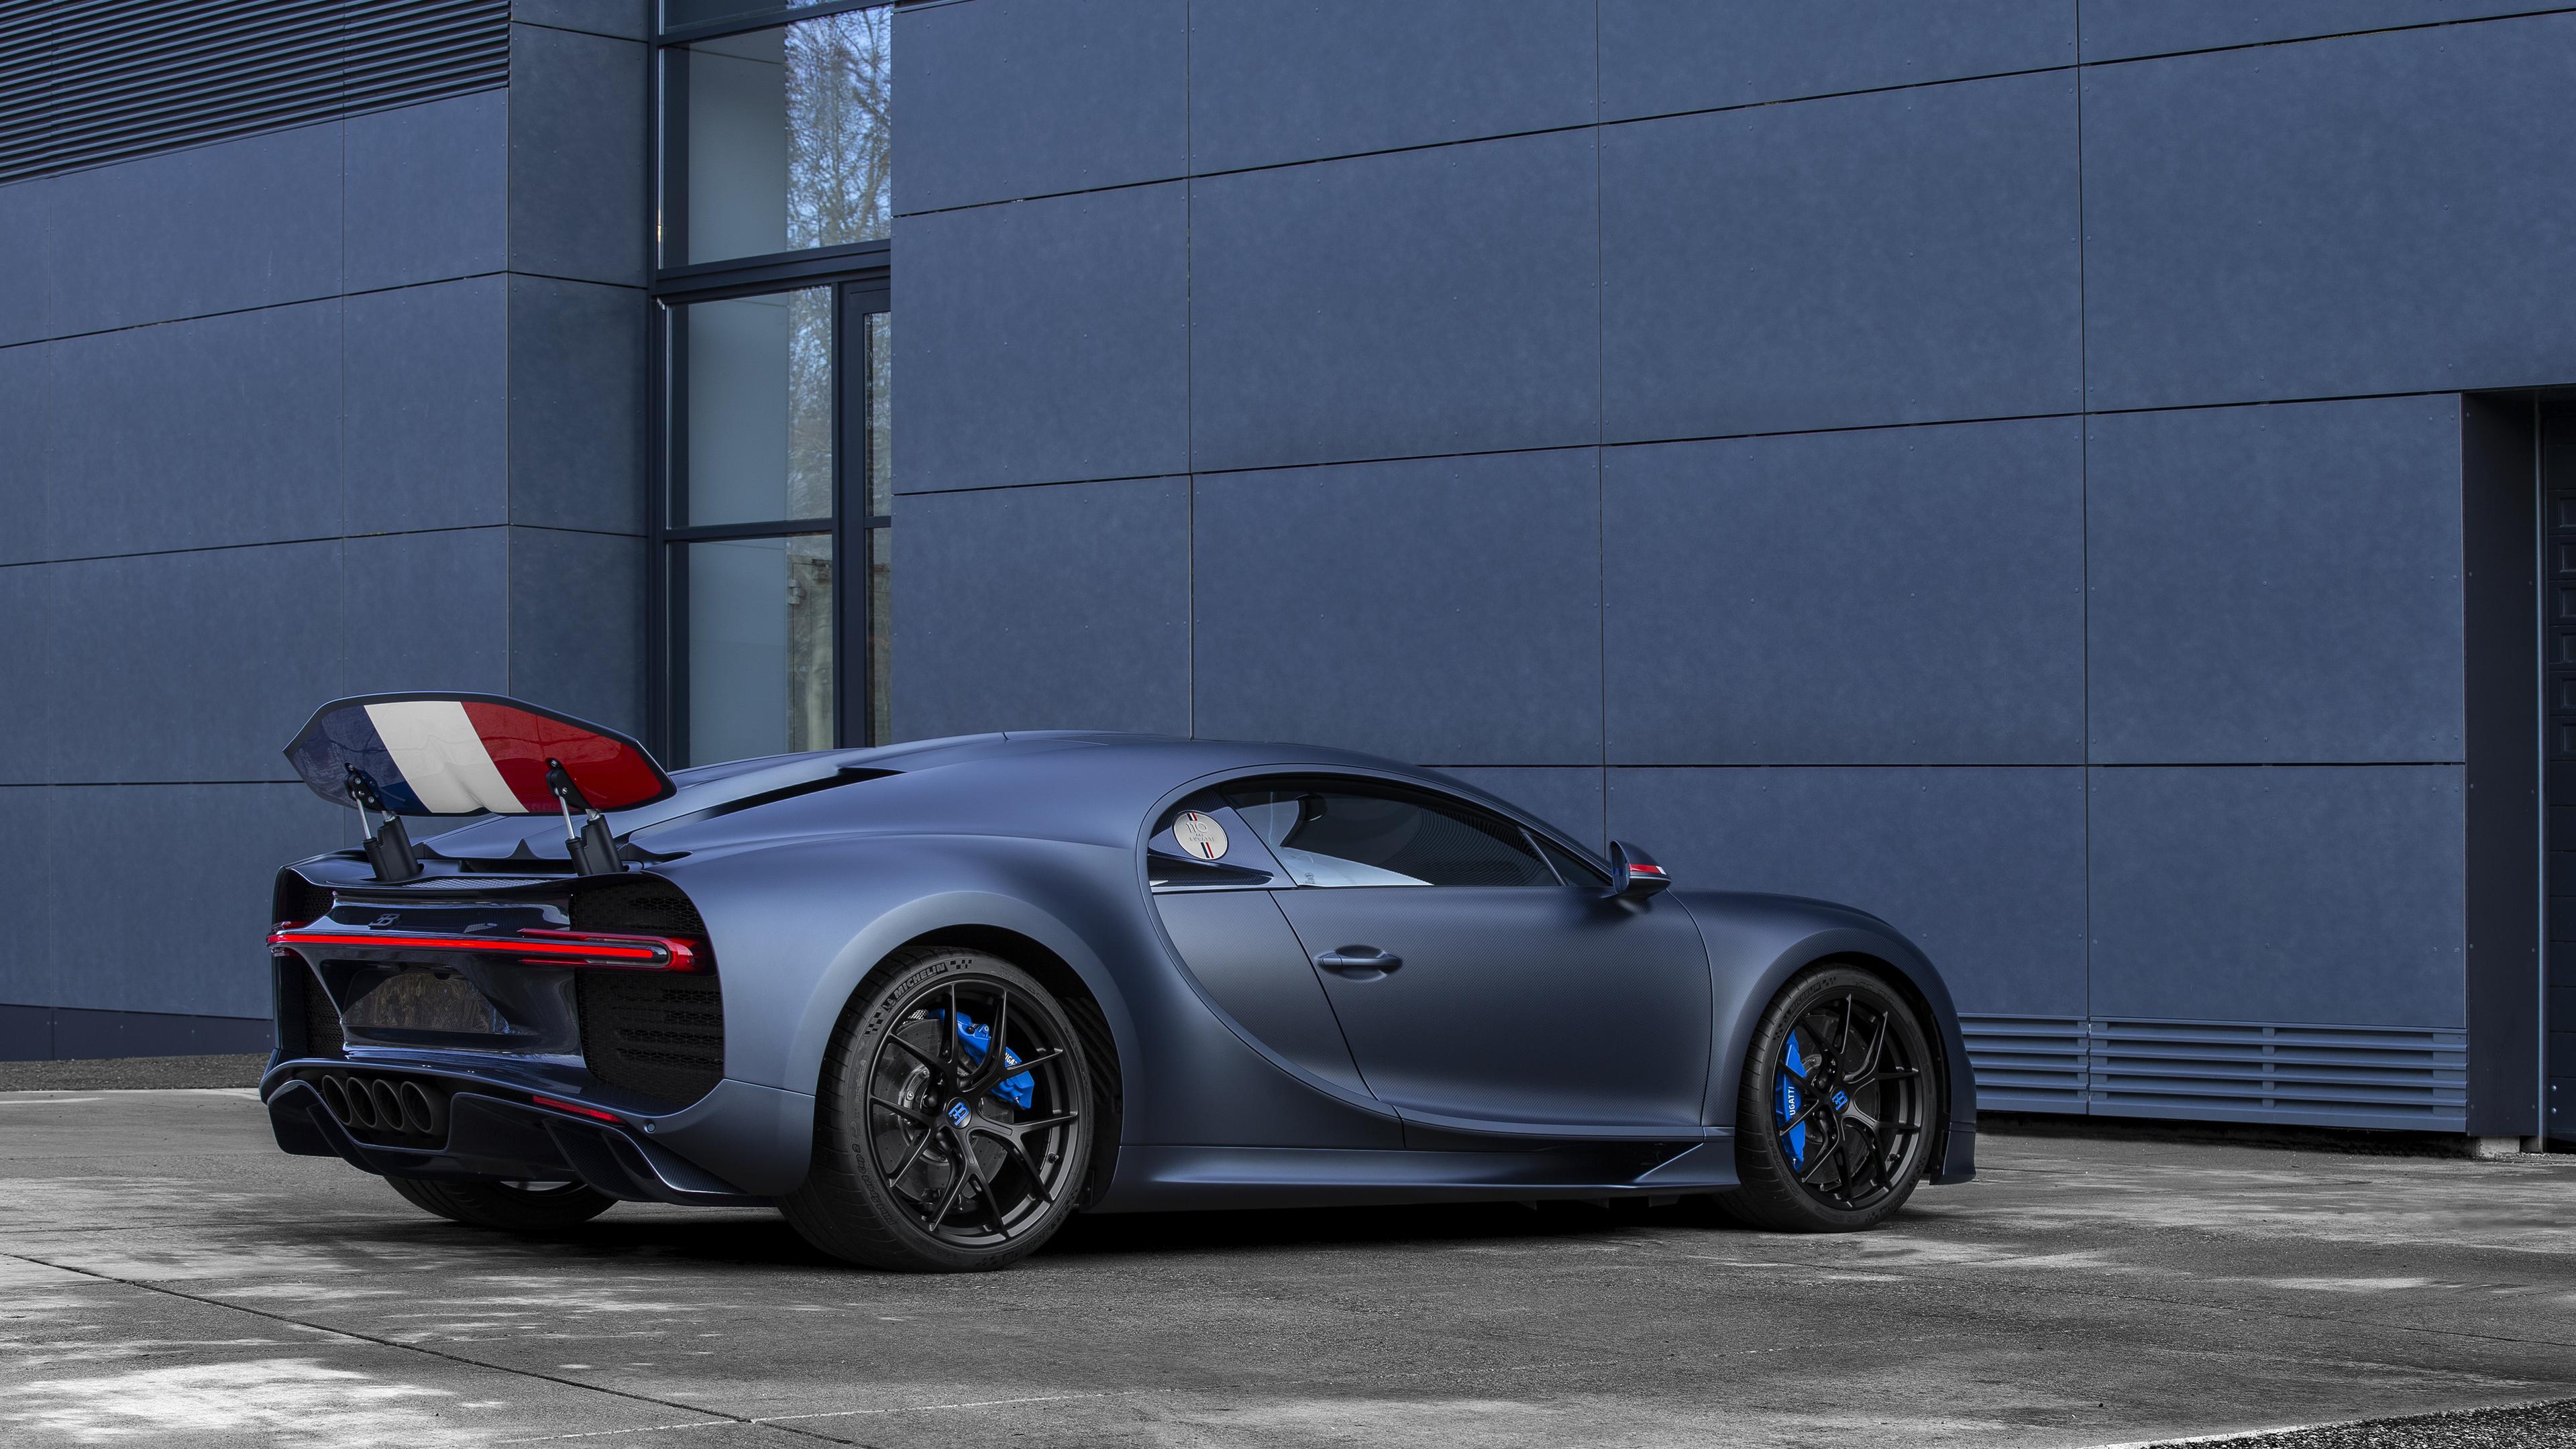 Wallpaper 4k 2019 Bugatti Chiron Sport 110 Ans Rear 4k 2019 Cars